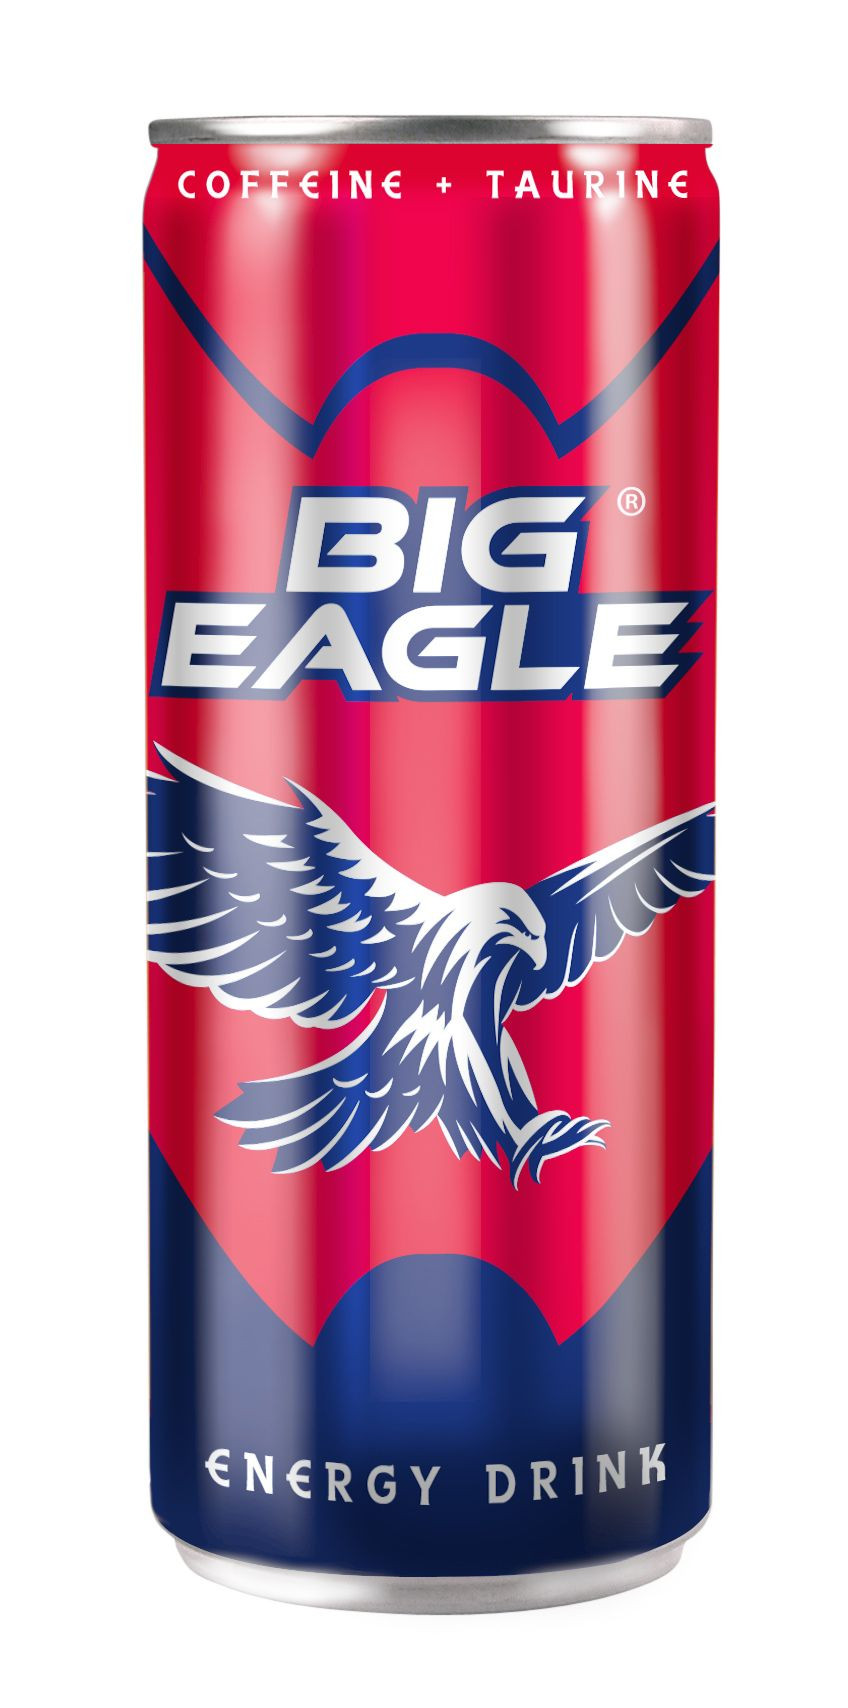 Big Eagle Energy Drink 250 ml can